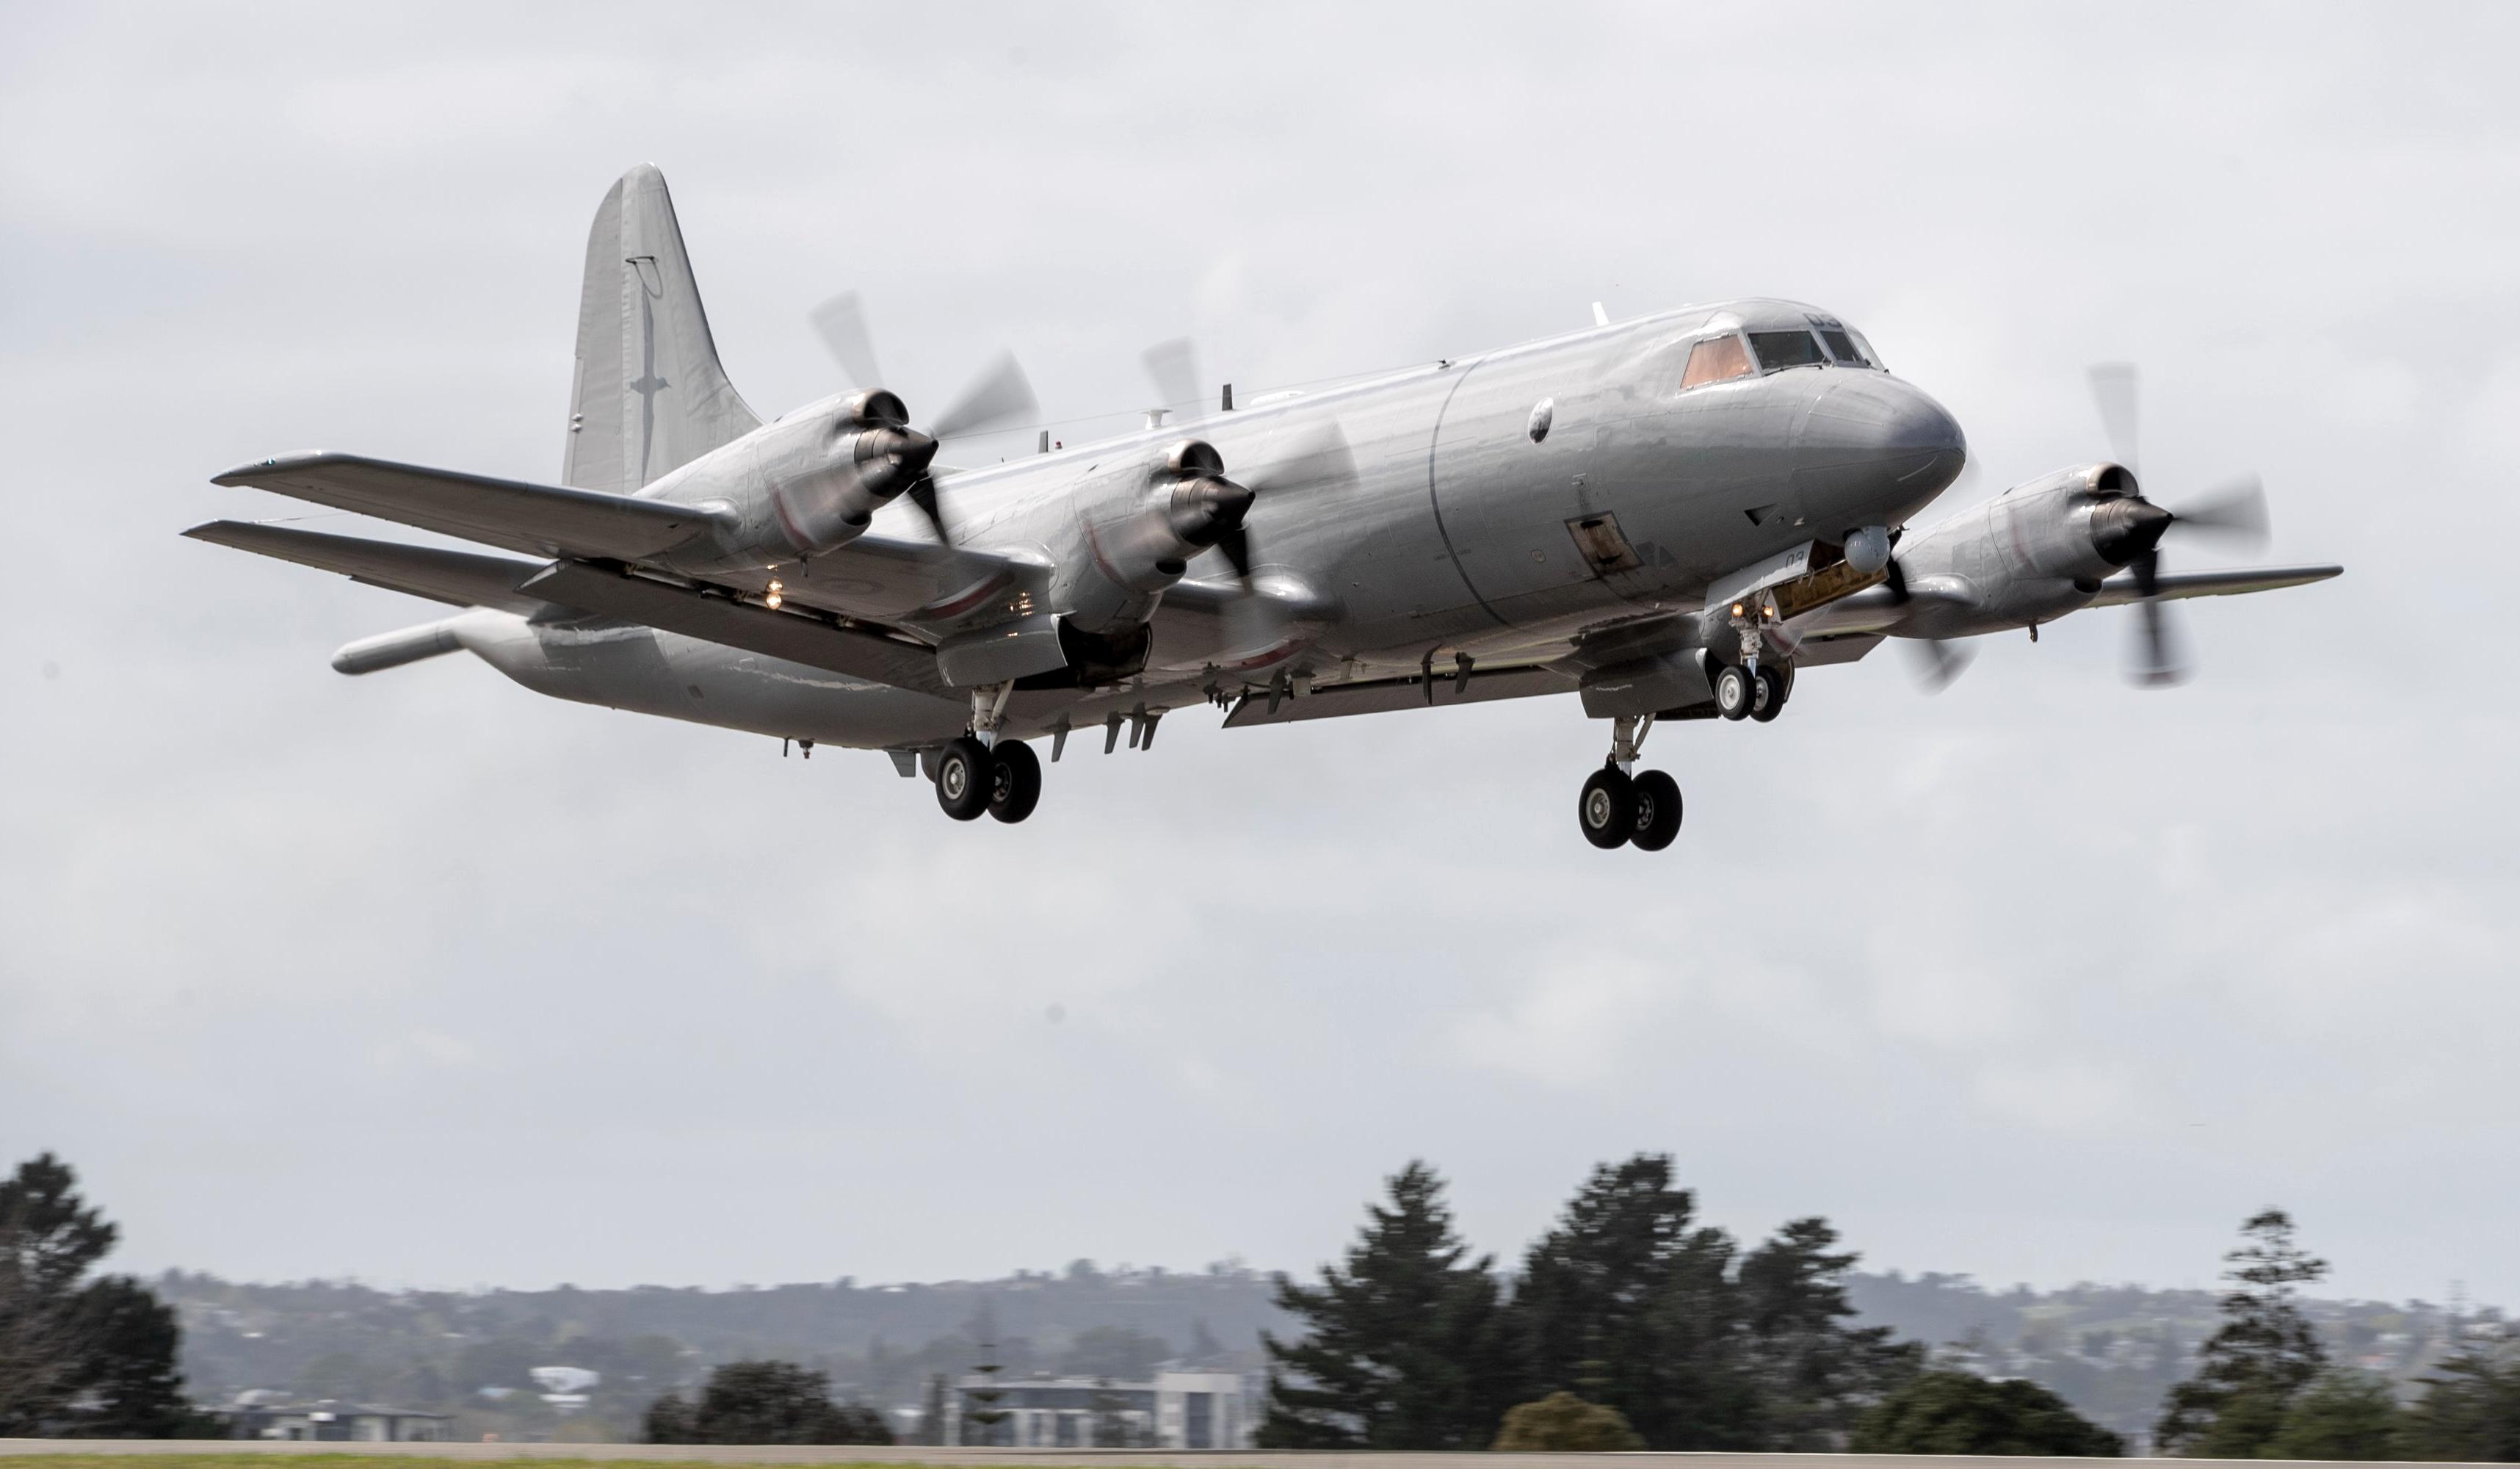 First RNZAF P-3K2 Orion retirement 24-09-21 [RNZAF]